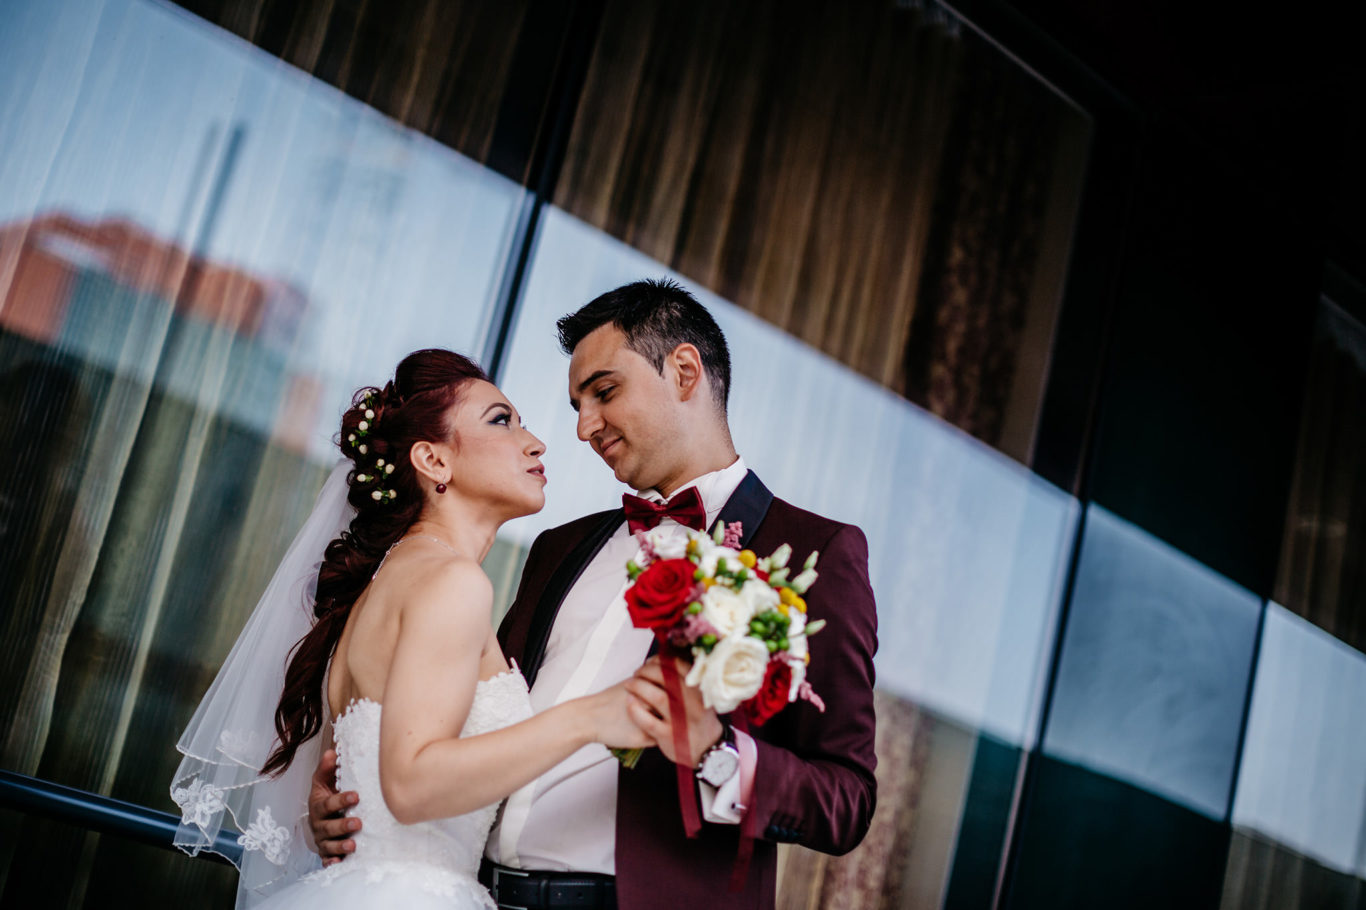 0158-fotografie-nunta-bucuresti-cristina-nicusor-fotograf-ciprian-dumitrescu-cd2_0976